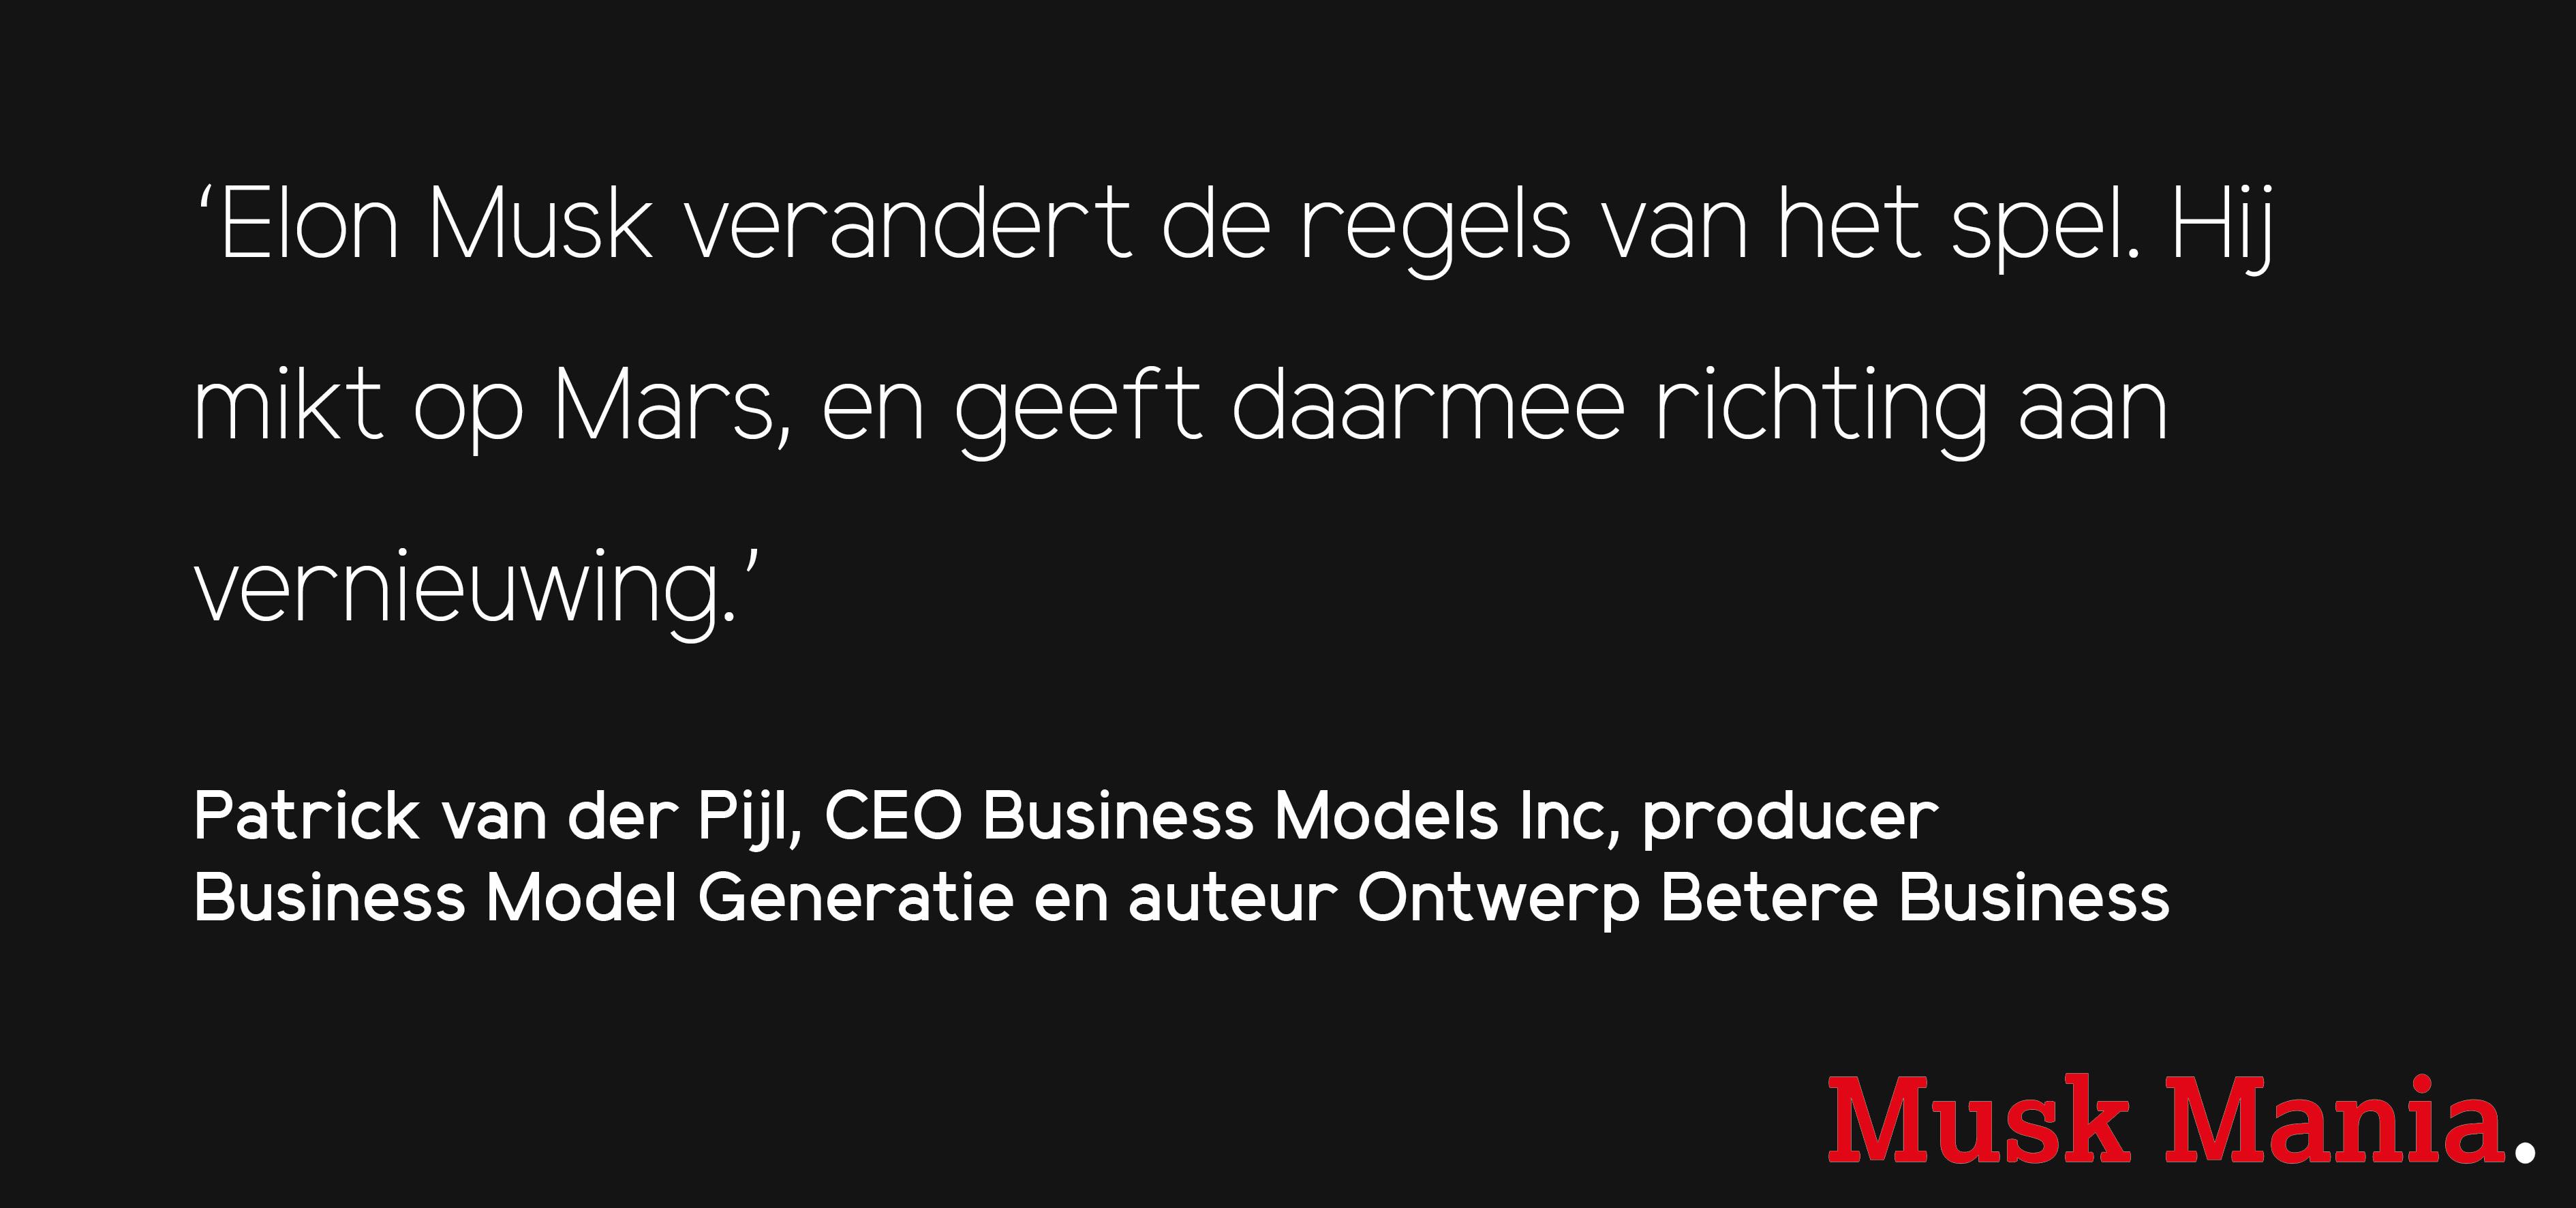 Patrick van der Pijl (Business Model Generation) over Musk Mania